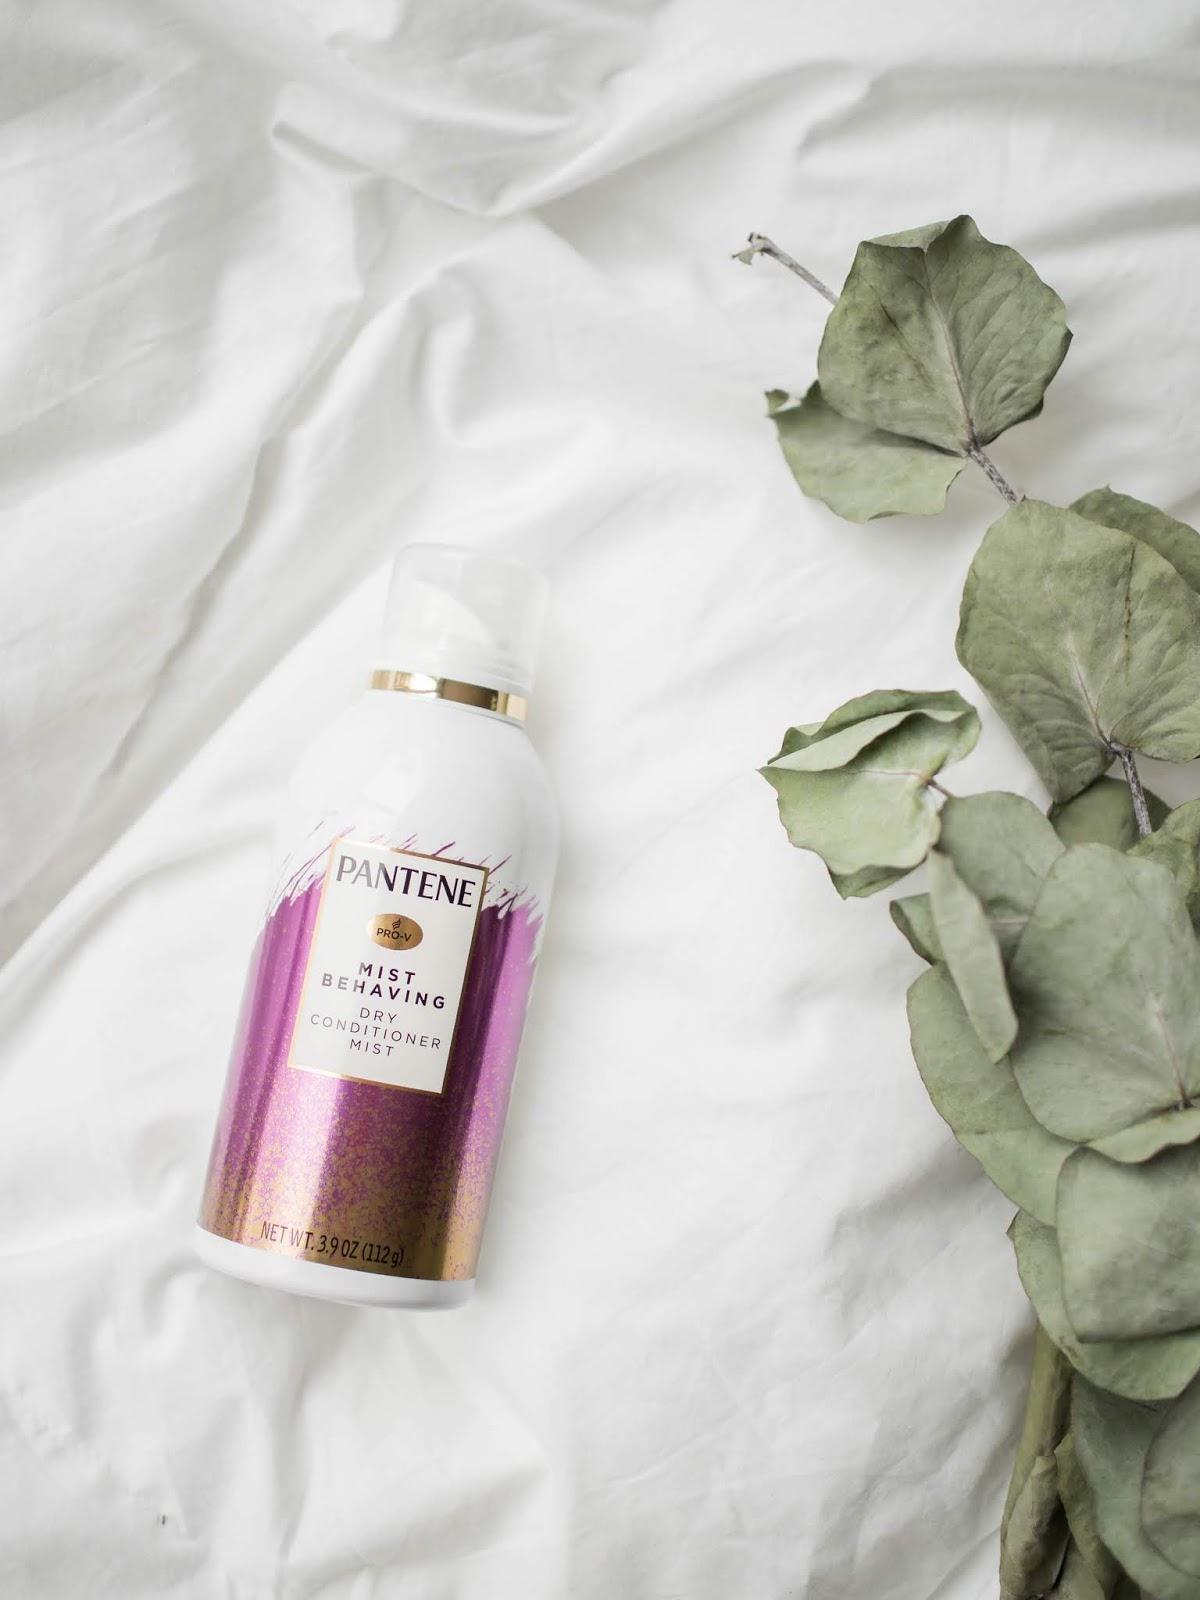 Haircare: Pantene Pro-V Mist Behaving Dry Conditioner Mist - Hiustenhoito, hoitoaine, suihkutettava hoitoaine